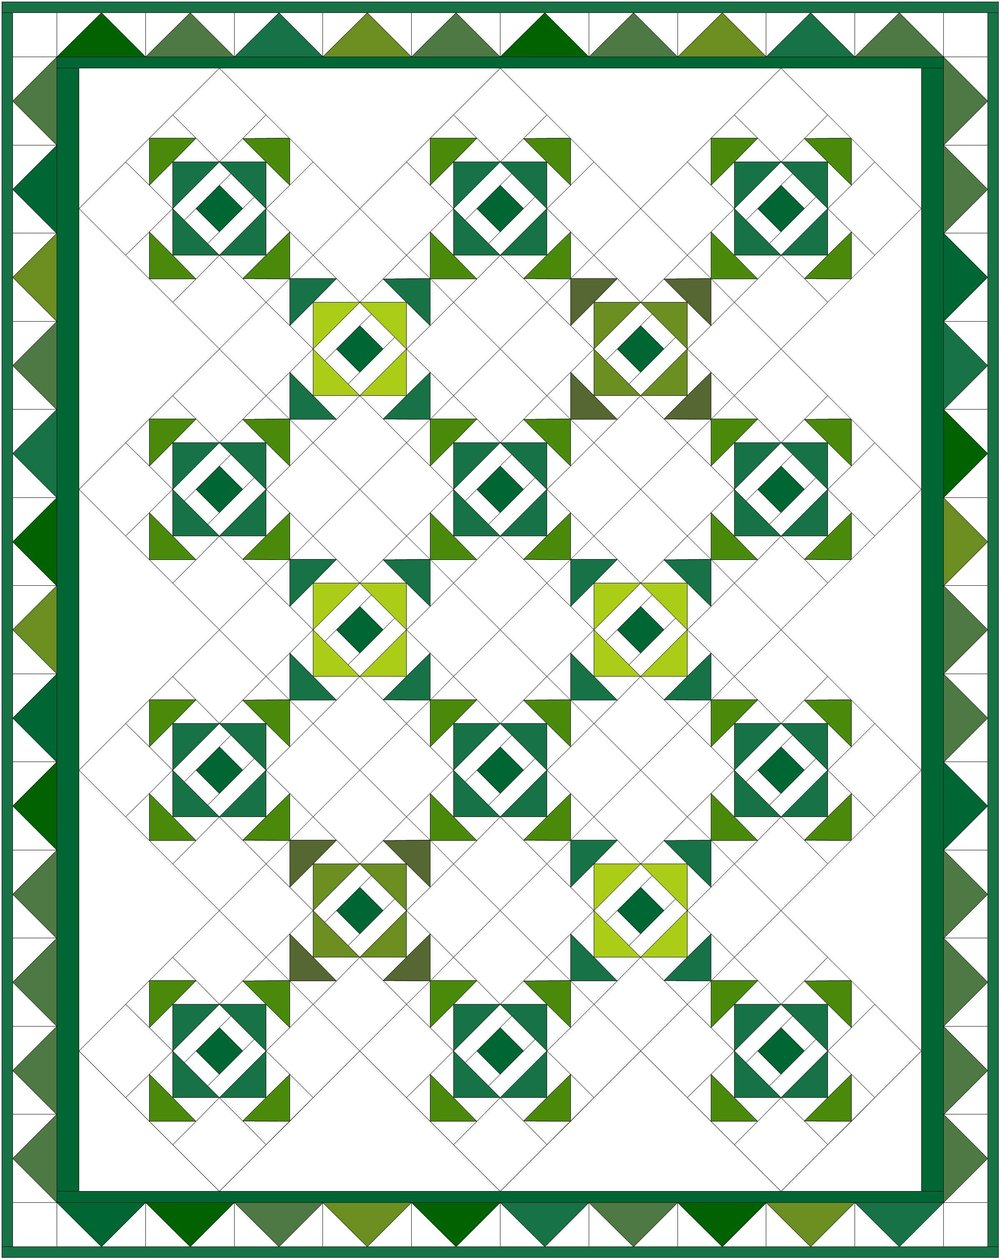 My quilt idea 3.JPG